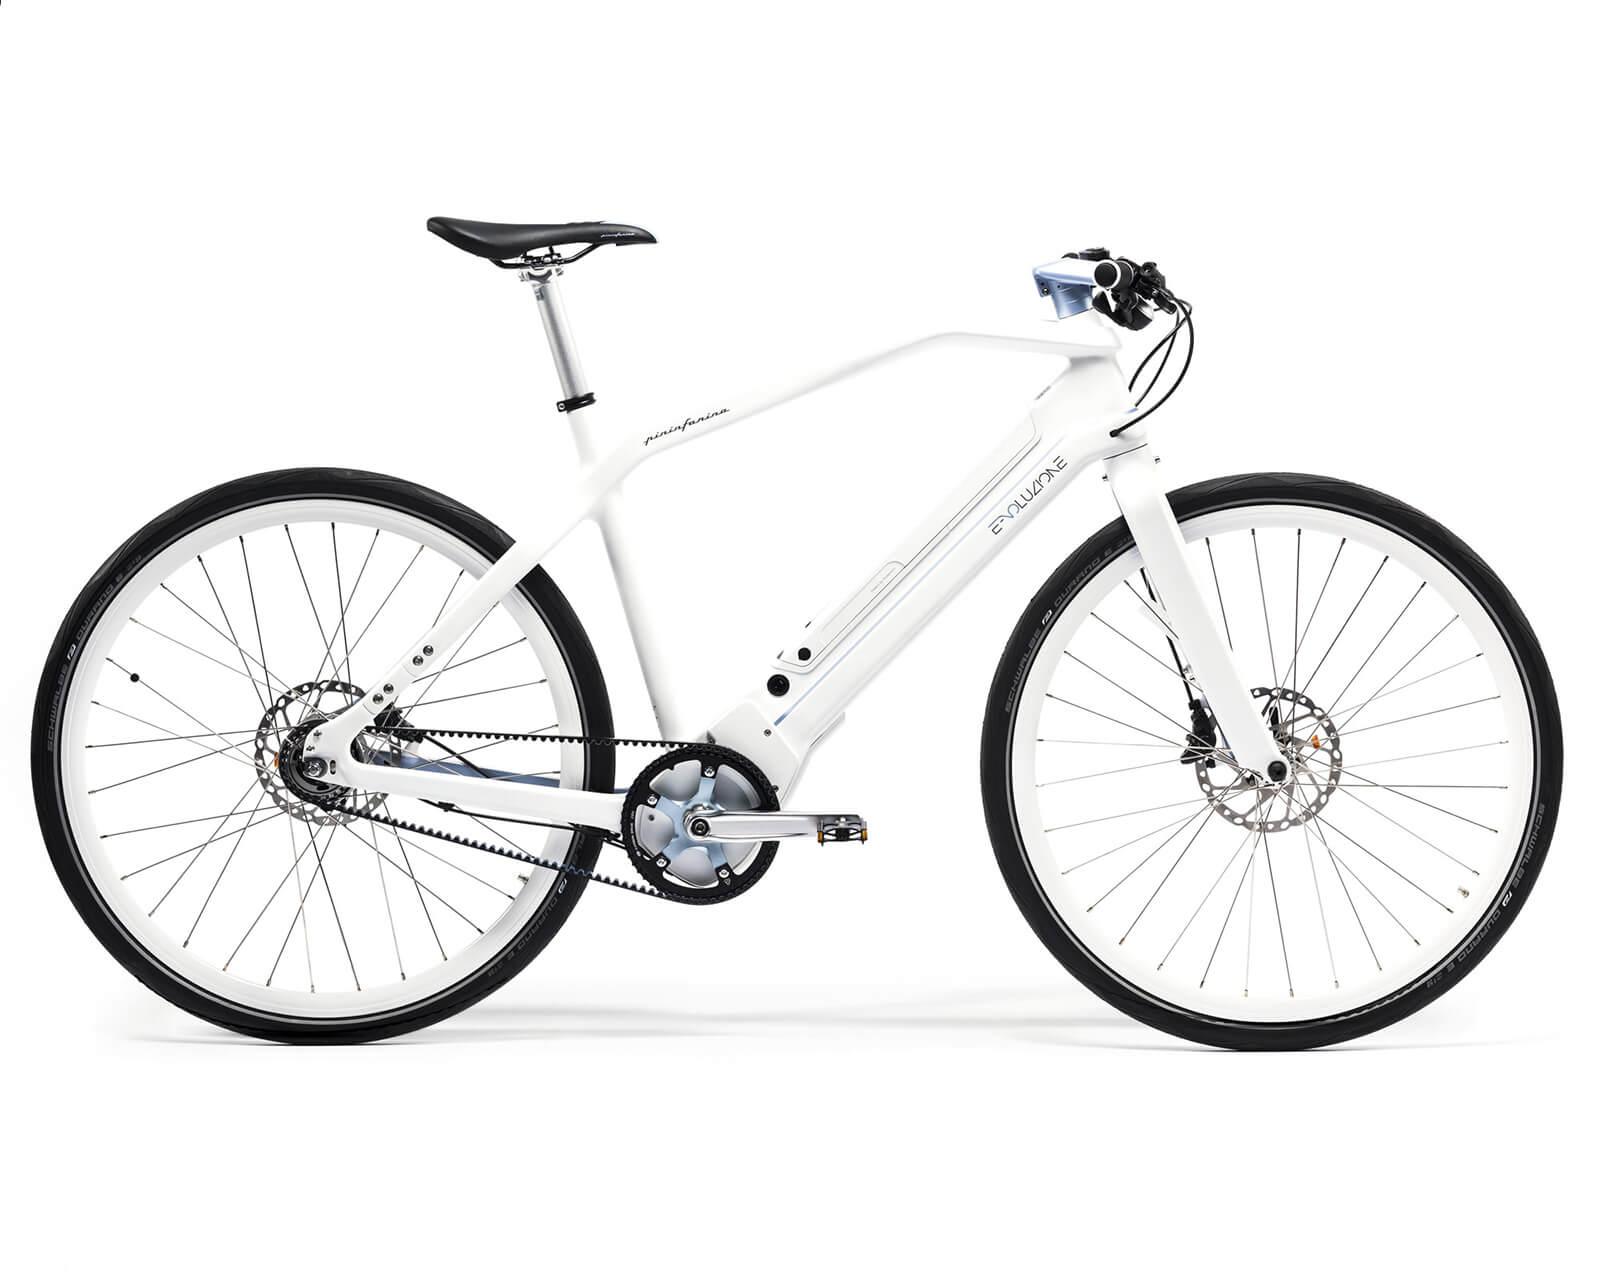 e-bike pininfarina bicicletta